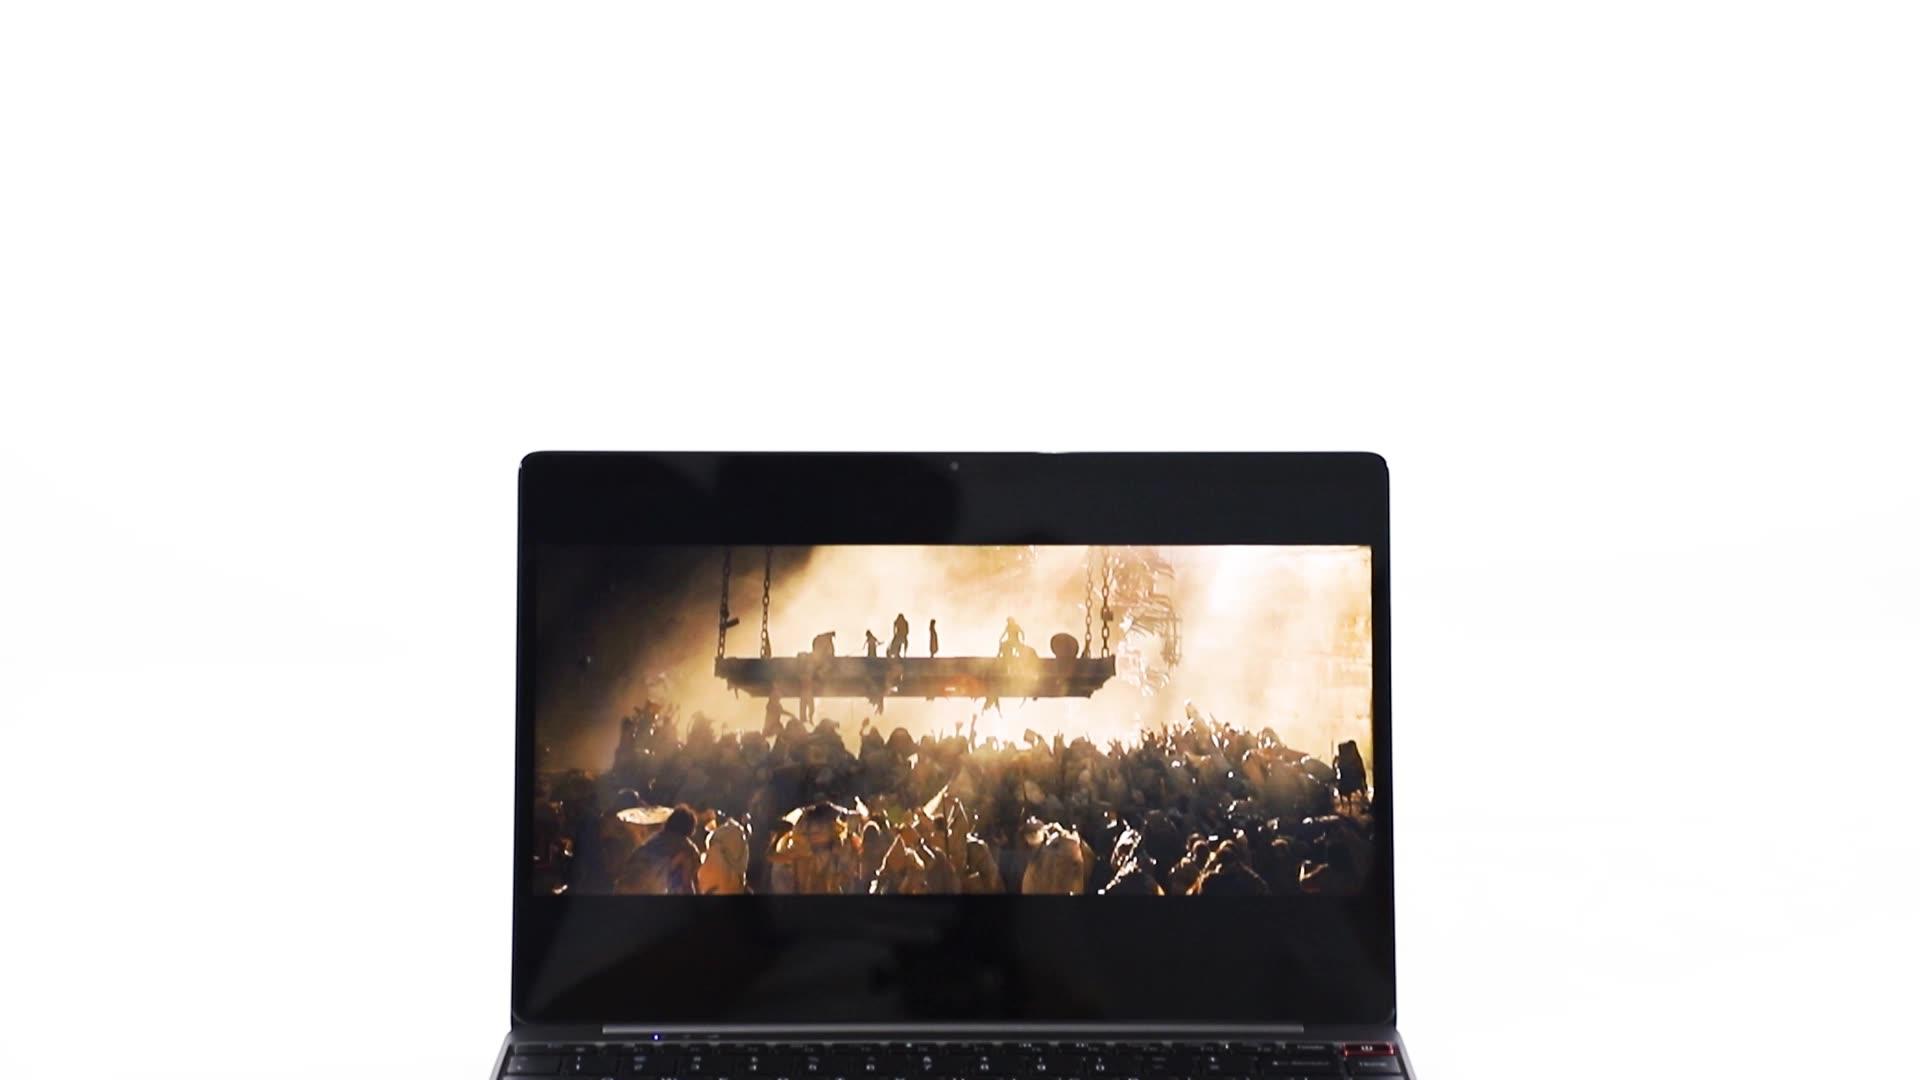 Grosir Laptop Mini CHUWI AeroBook Pro Intel Core Win10 13.3 Inci 8GB 256GB Netbook 38Wh Baterai PC BT4.0 Laptop Murah